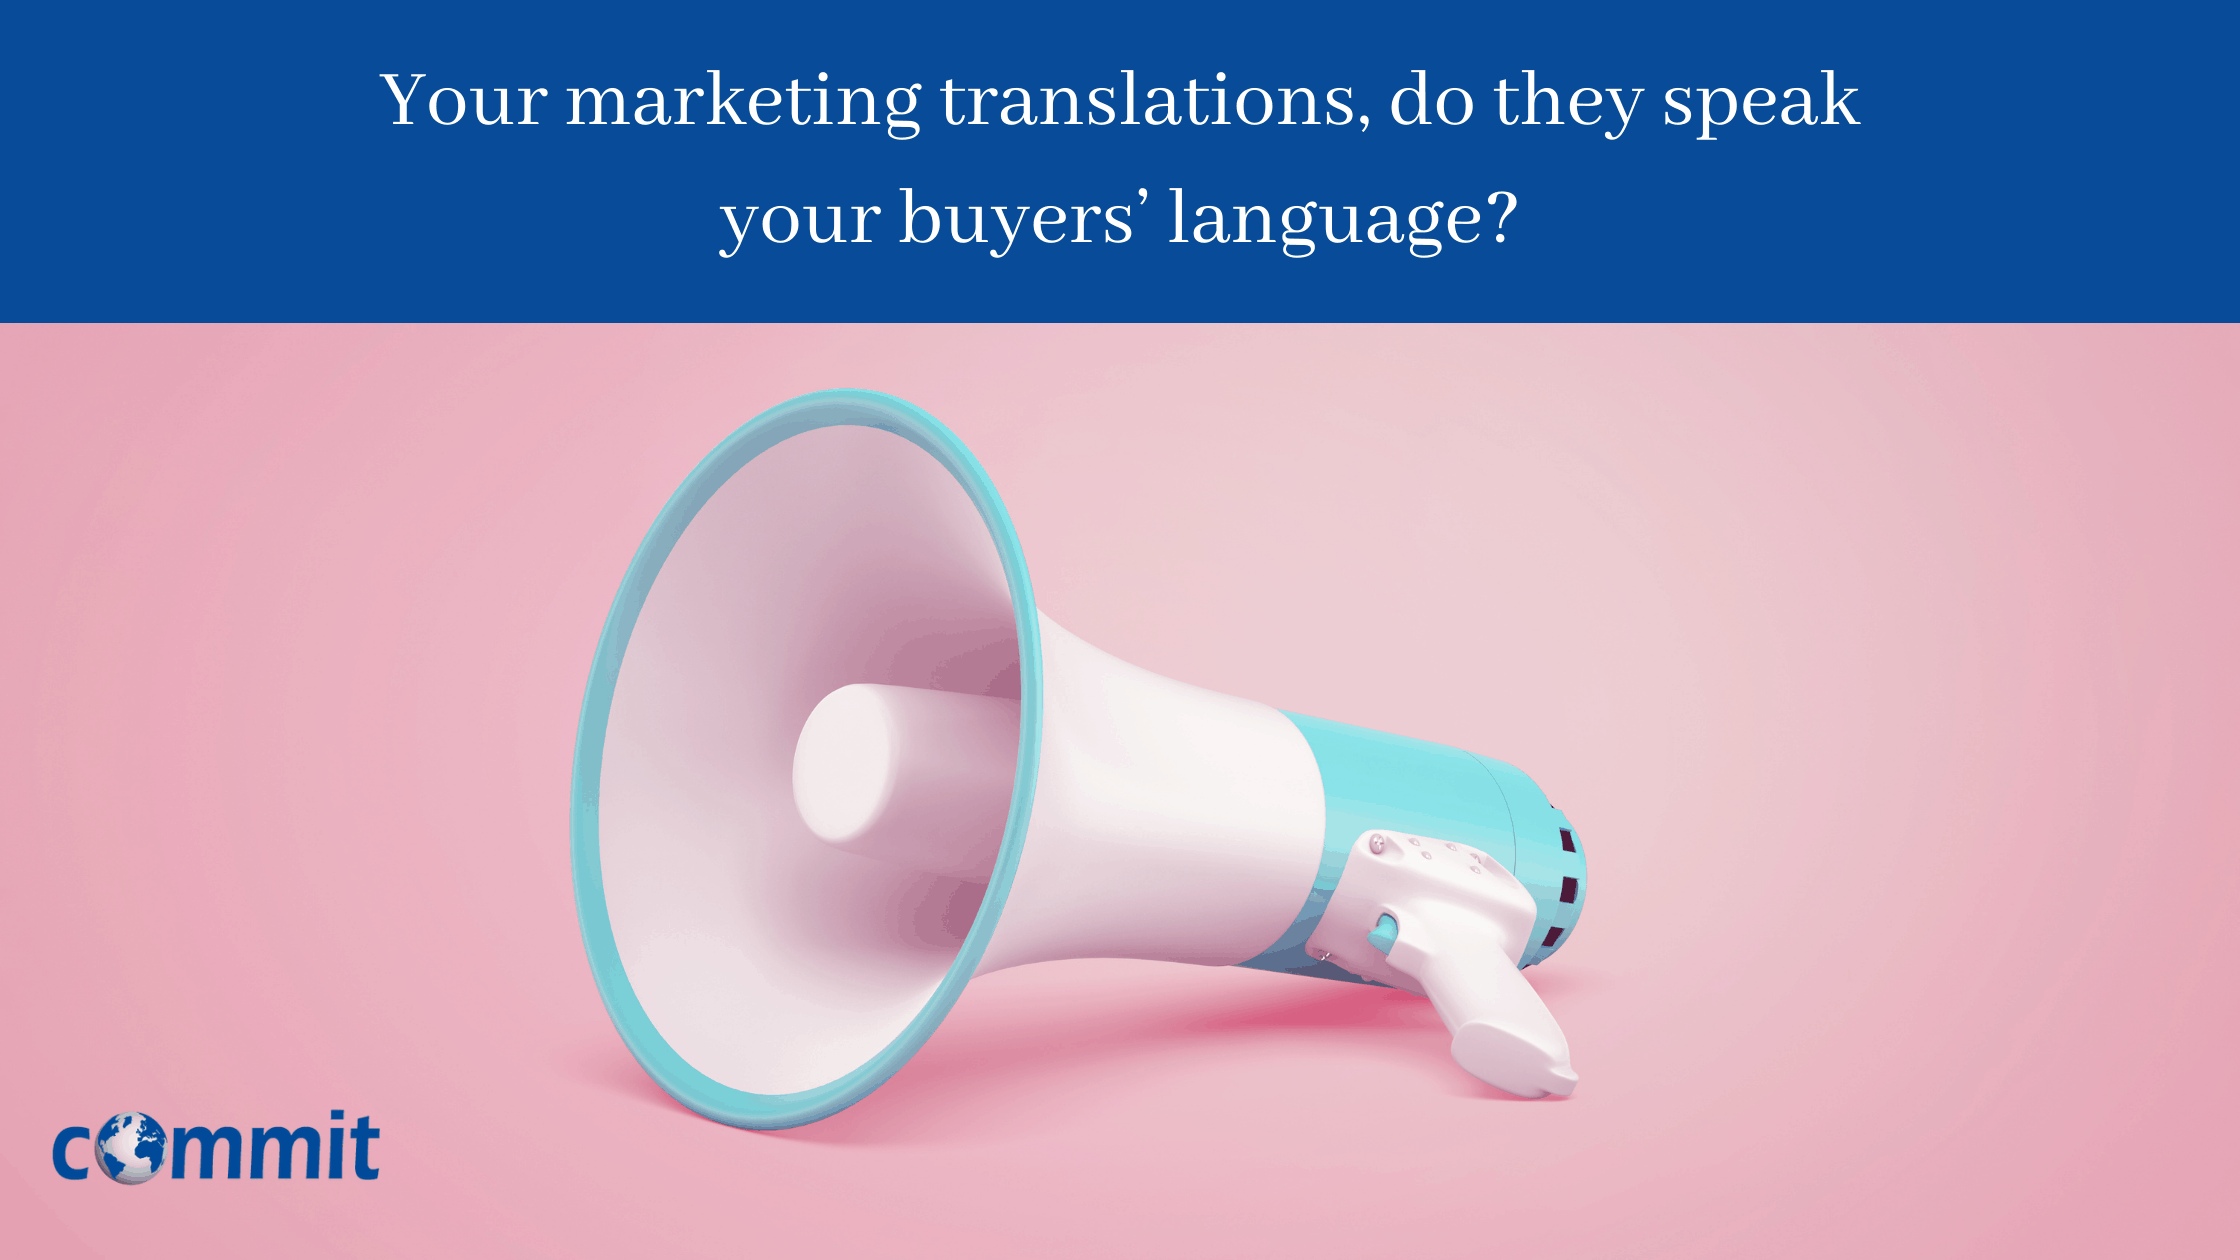 Your marketing translations, do they speak your buyers' language?